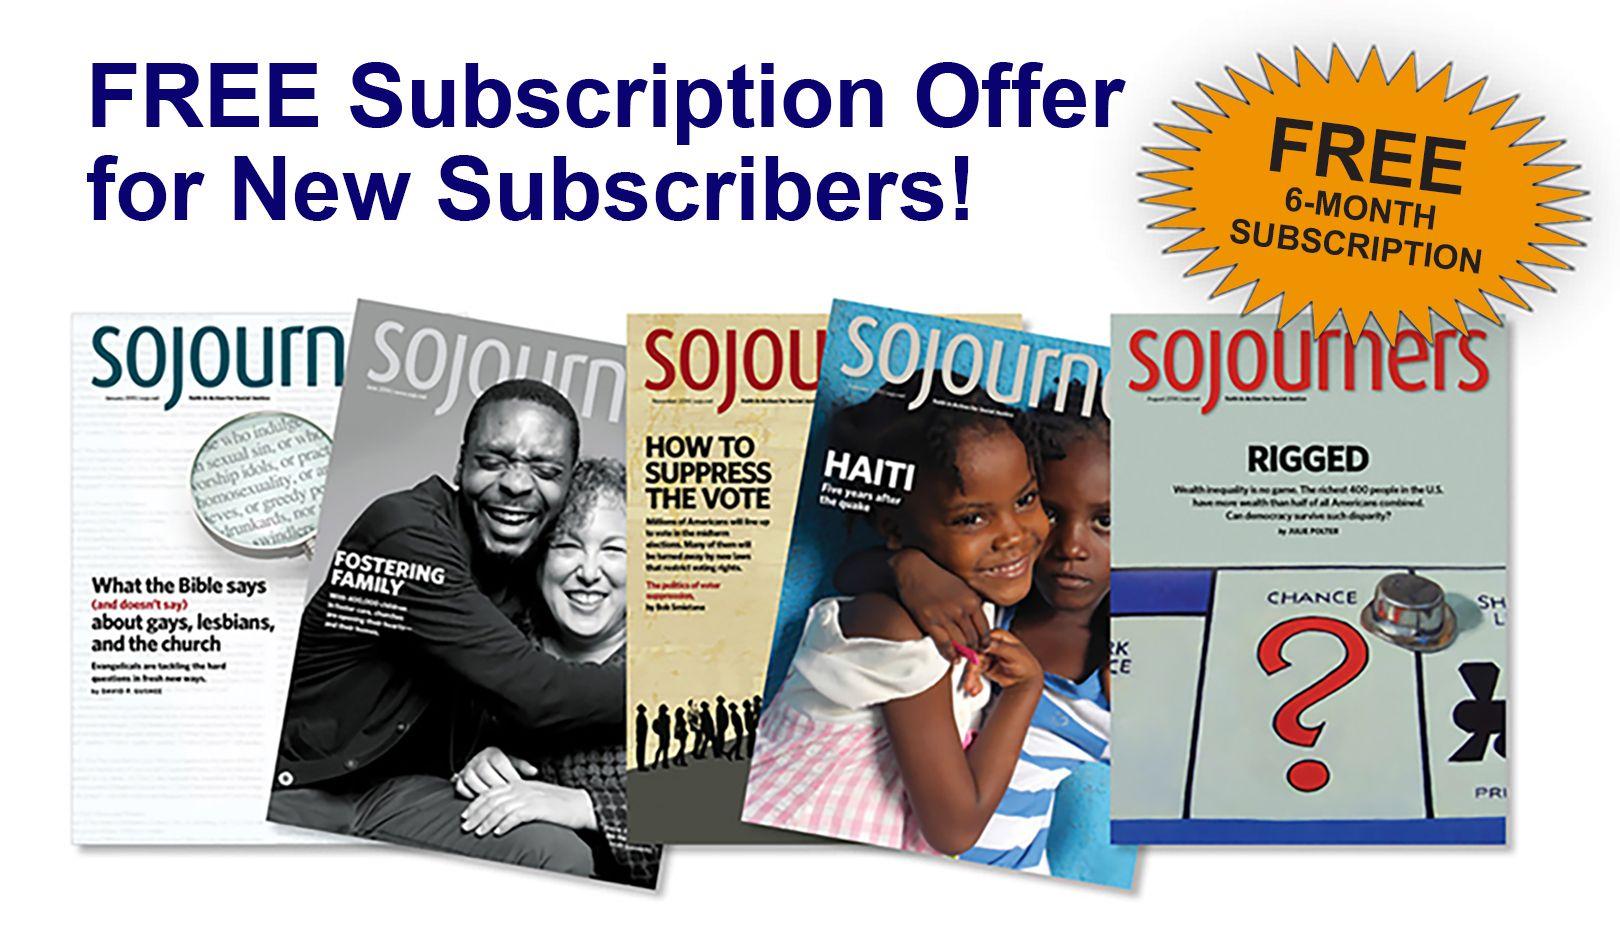 Sojourners Magazine | Sojourners, Free offer, Magazine